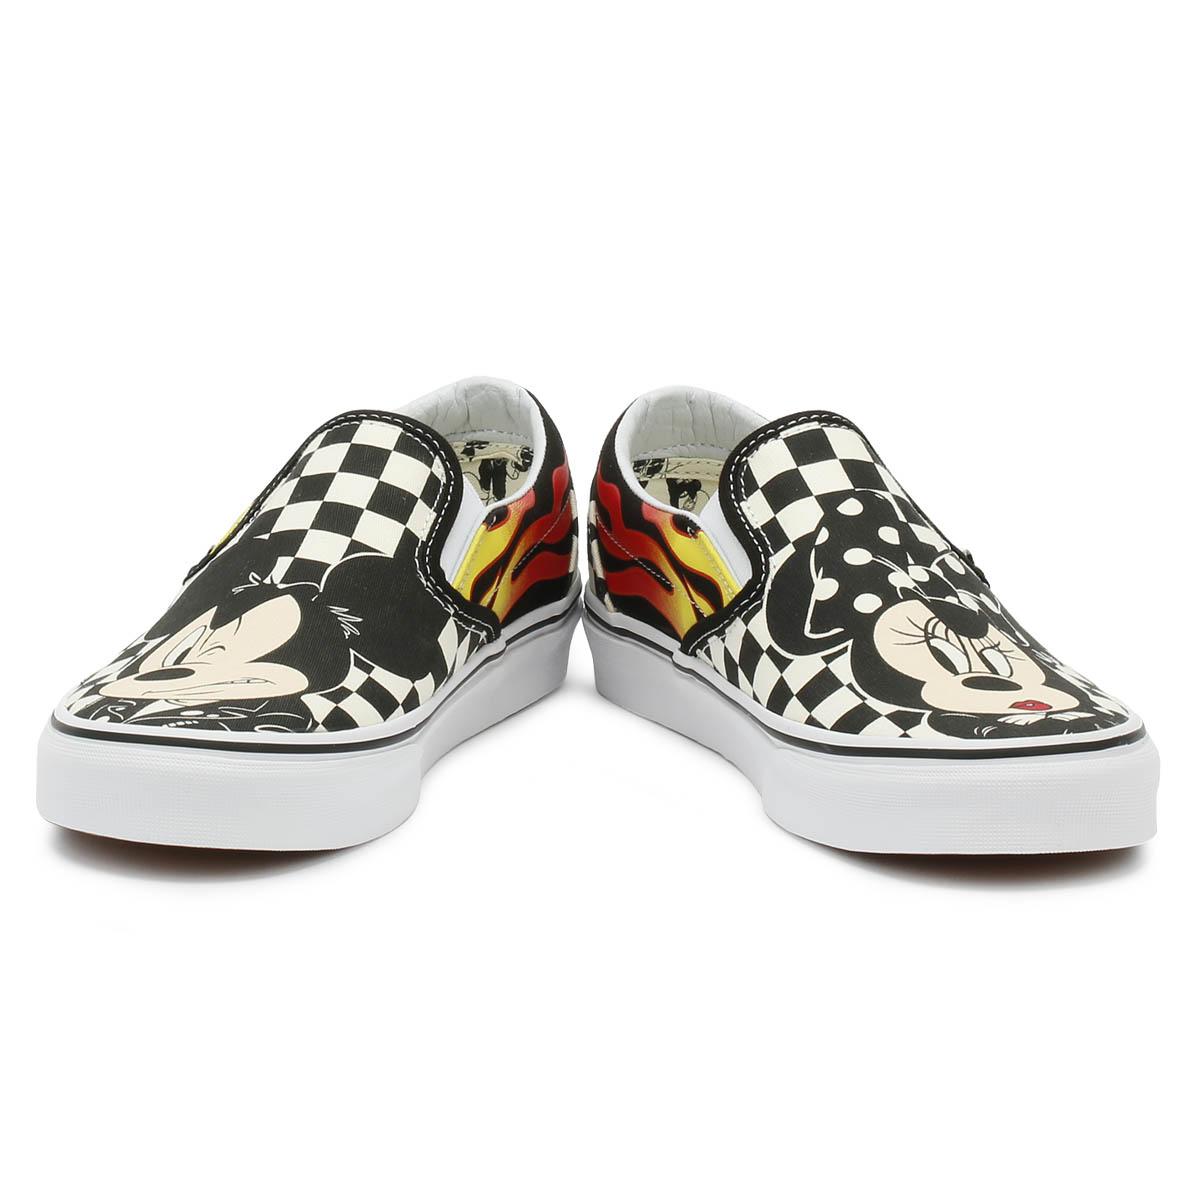 Vans Disney Unisex Unisex Disney Trainers Mickey  Minnie Checker Flame Sport Skate Schuhes f8d775